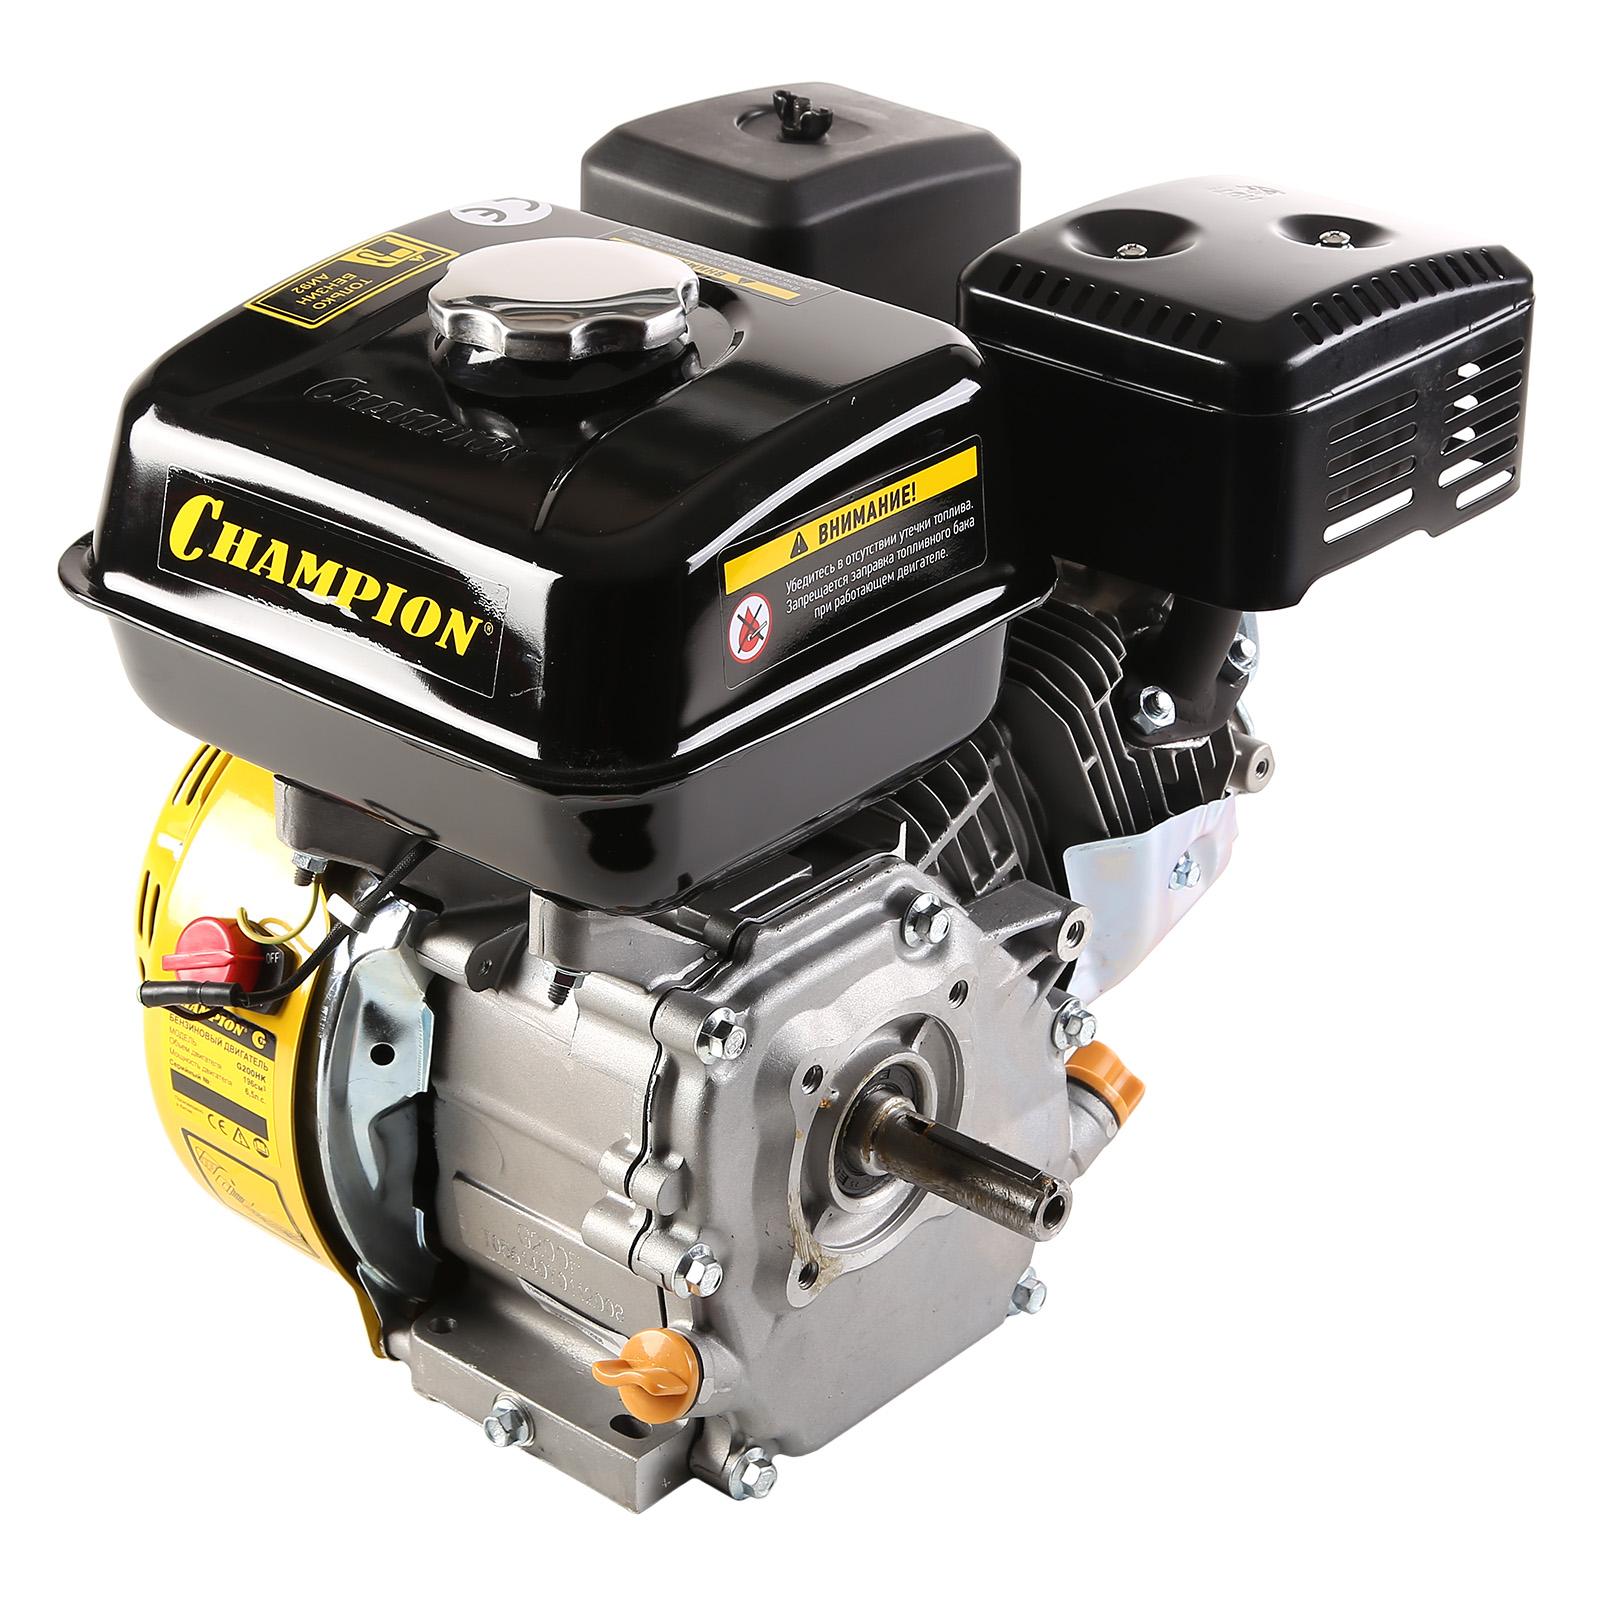 Двигатель Champion G200hk домкрат белак бак 00038 50т